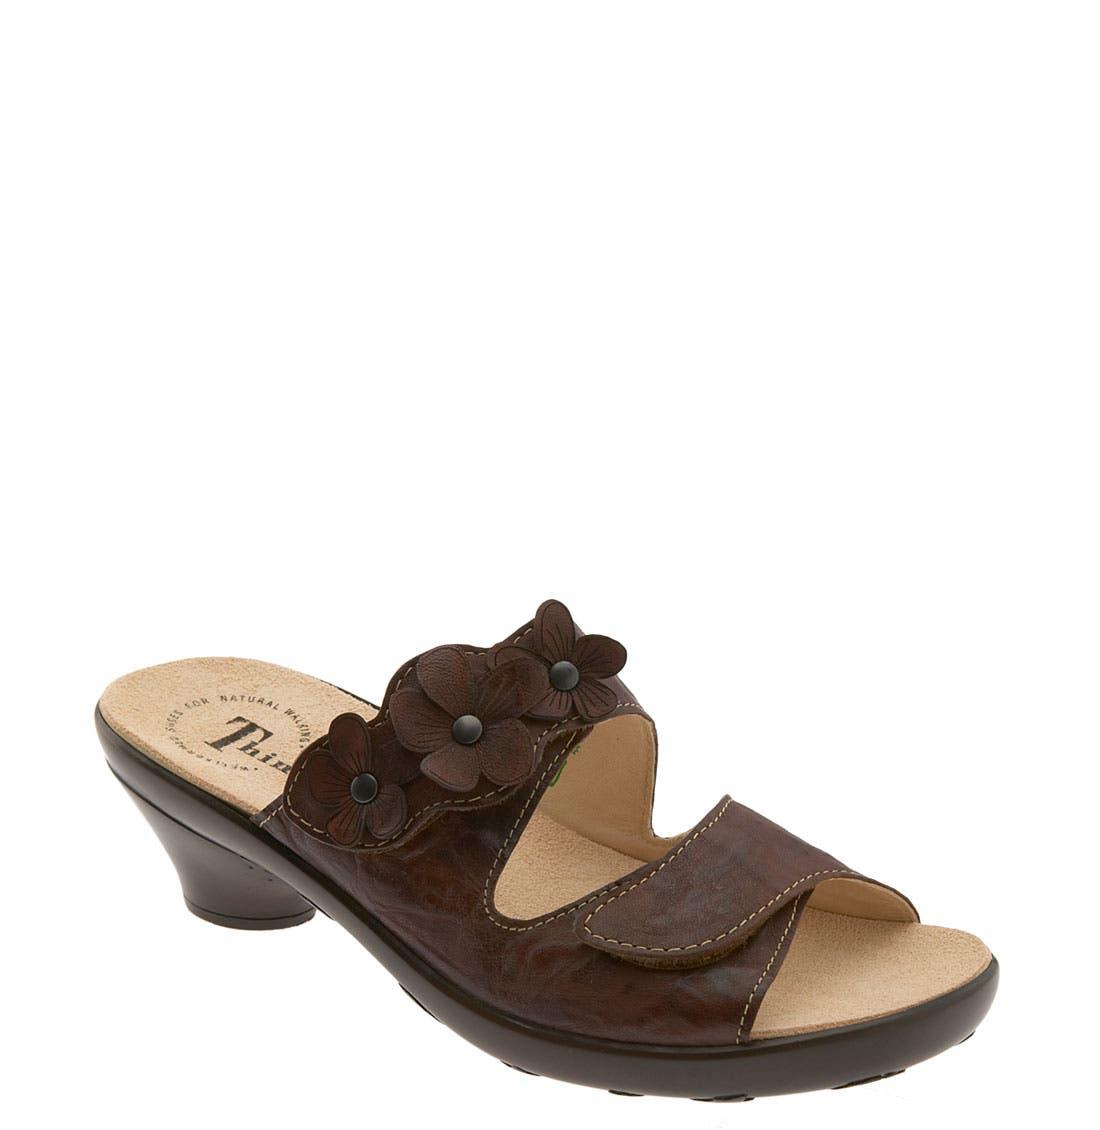 Main Image - Think! 'Cosima Flower' Sandal